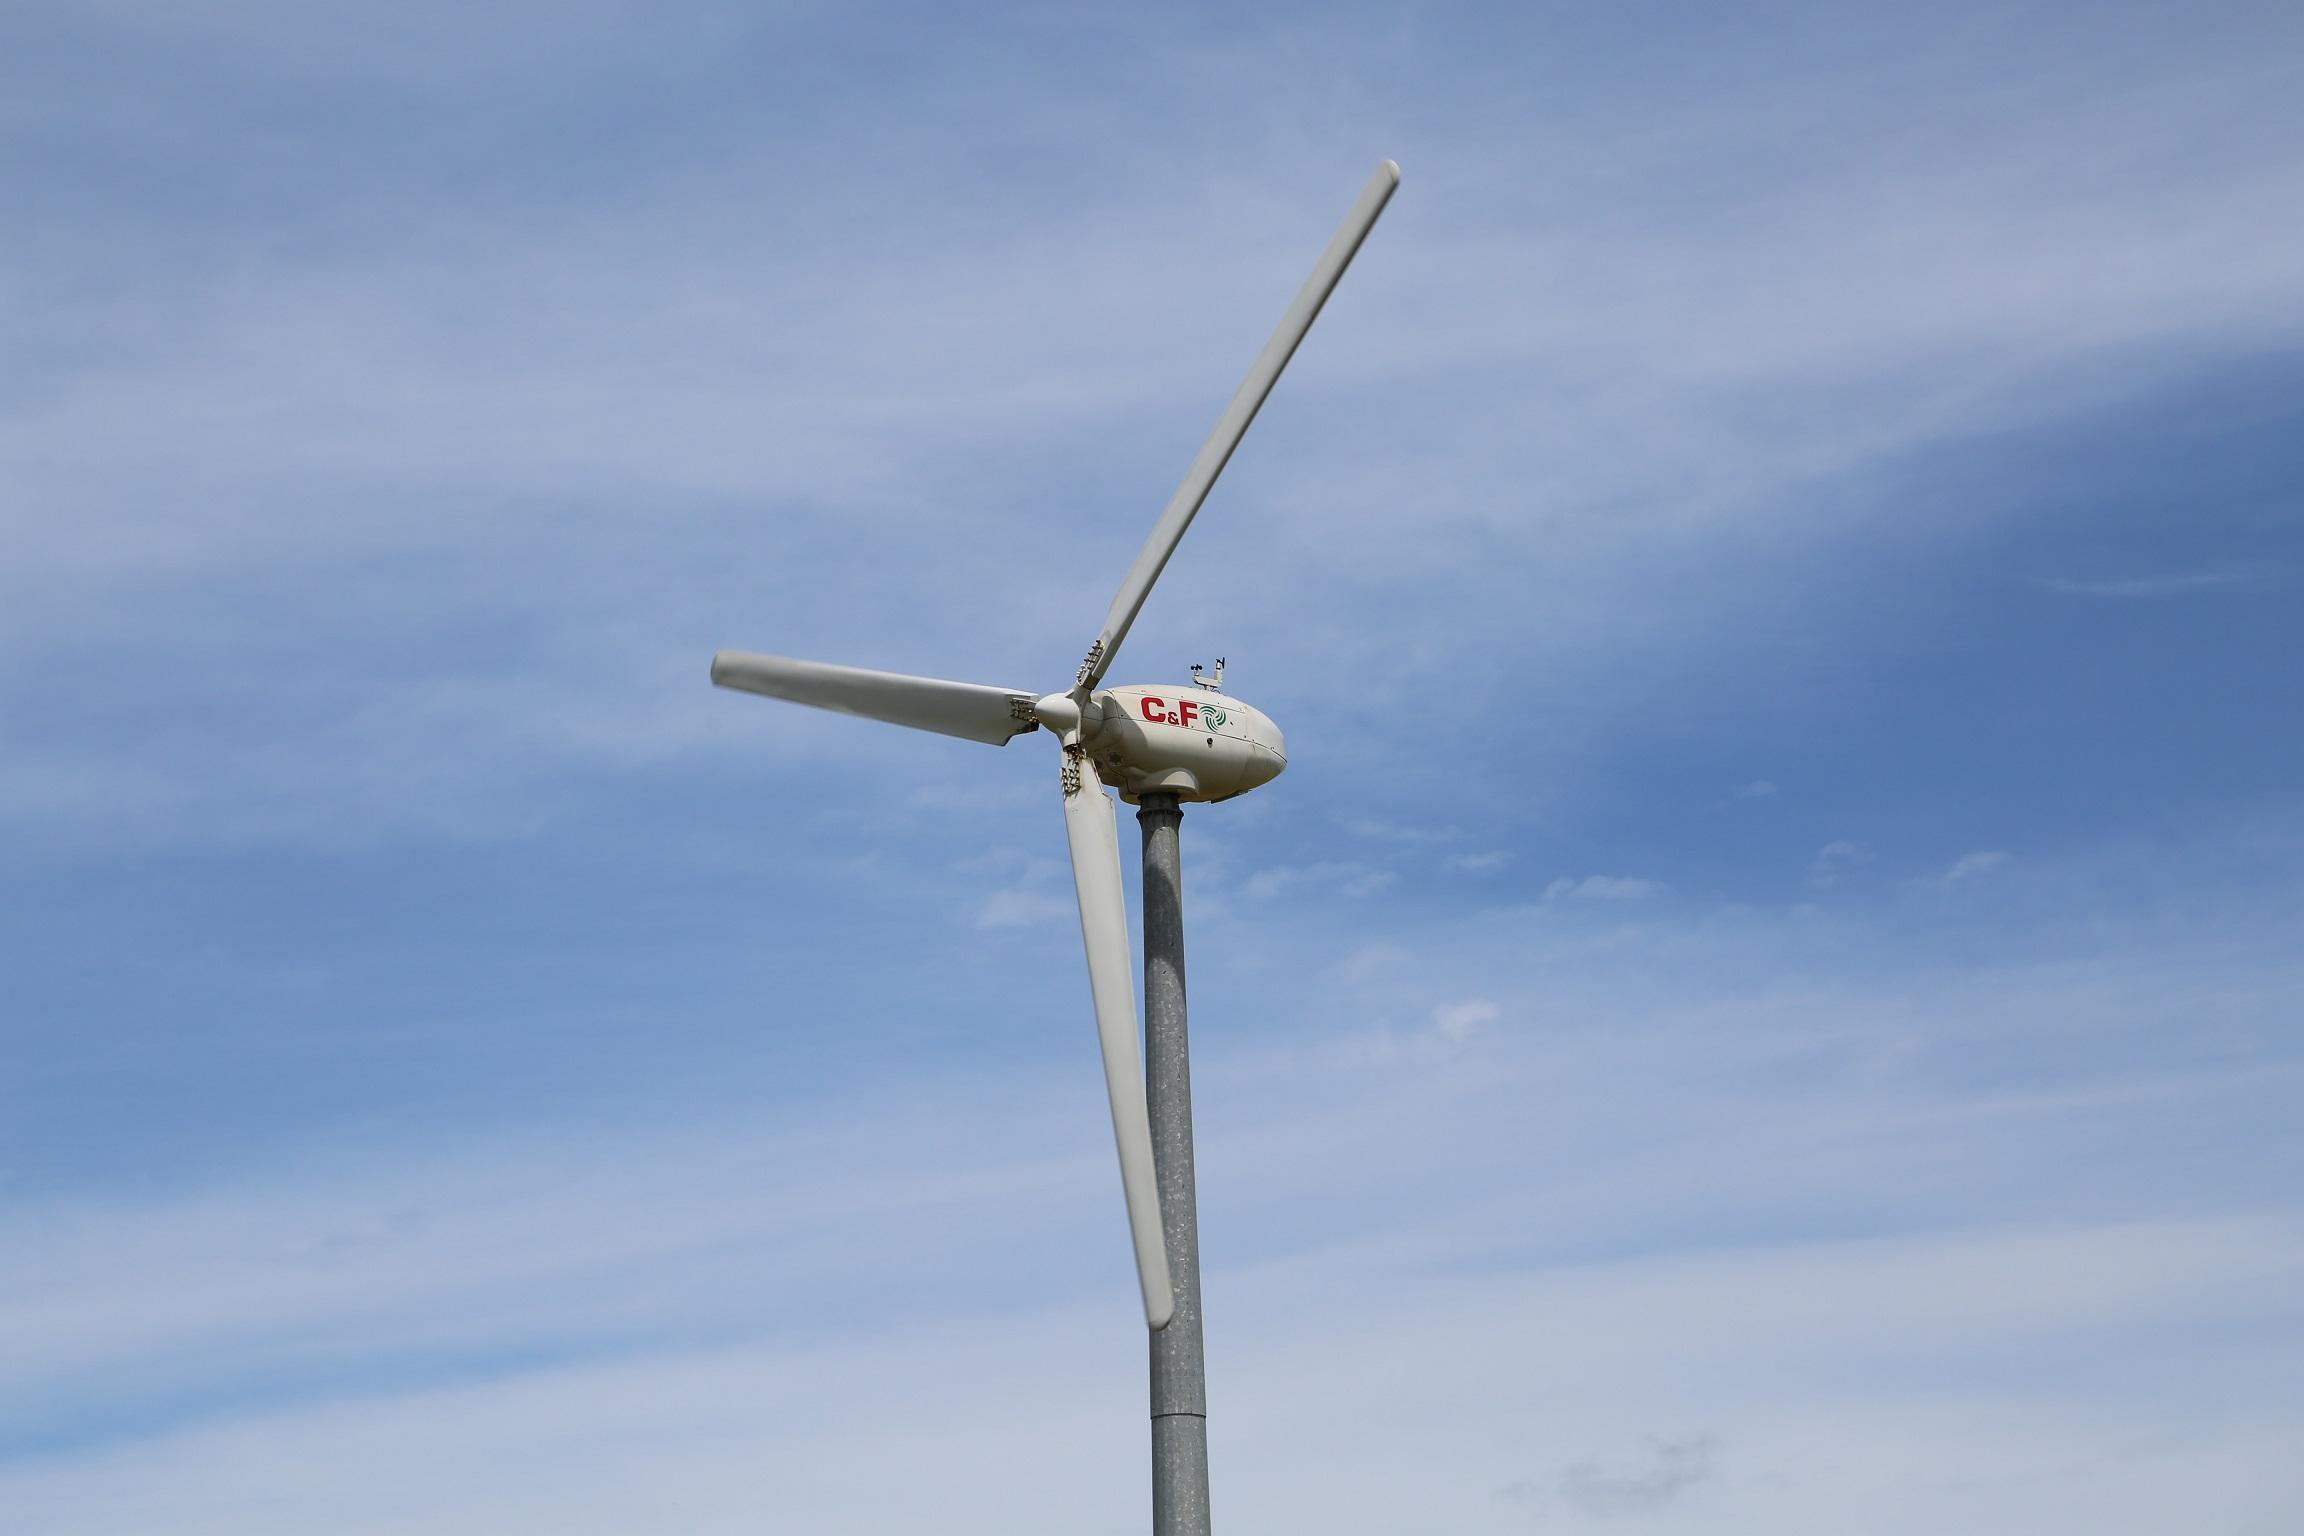 C&F CF 20 - 20,00 kW - Wind turbine